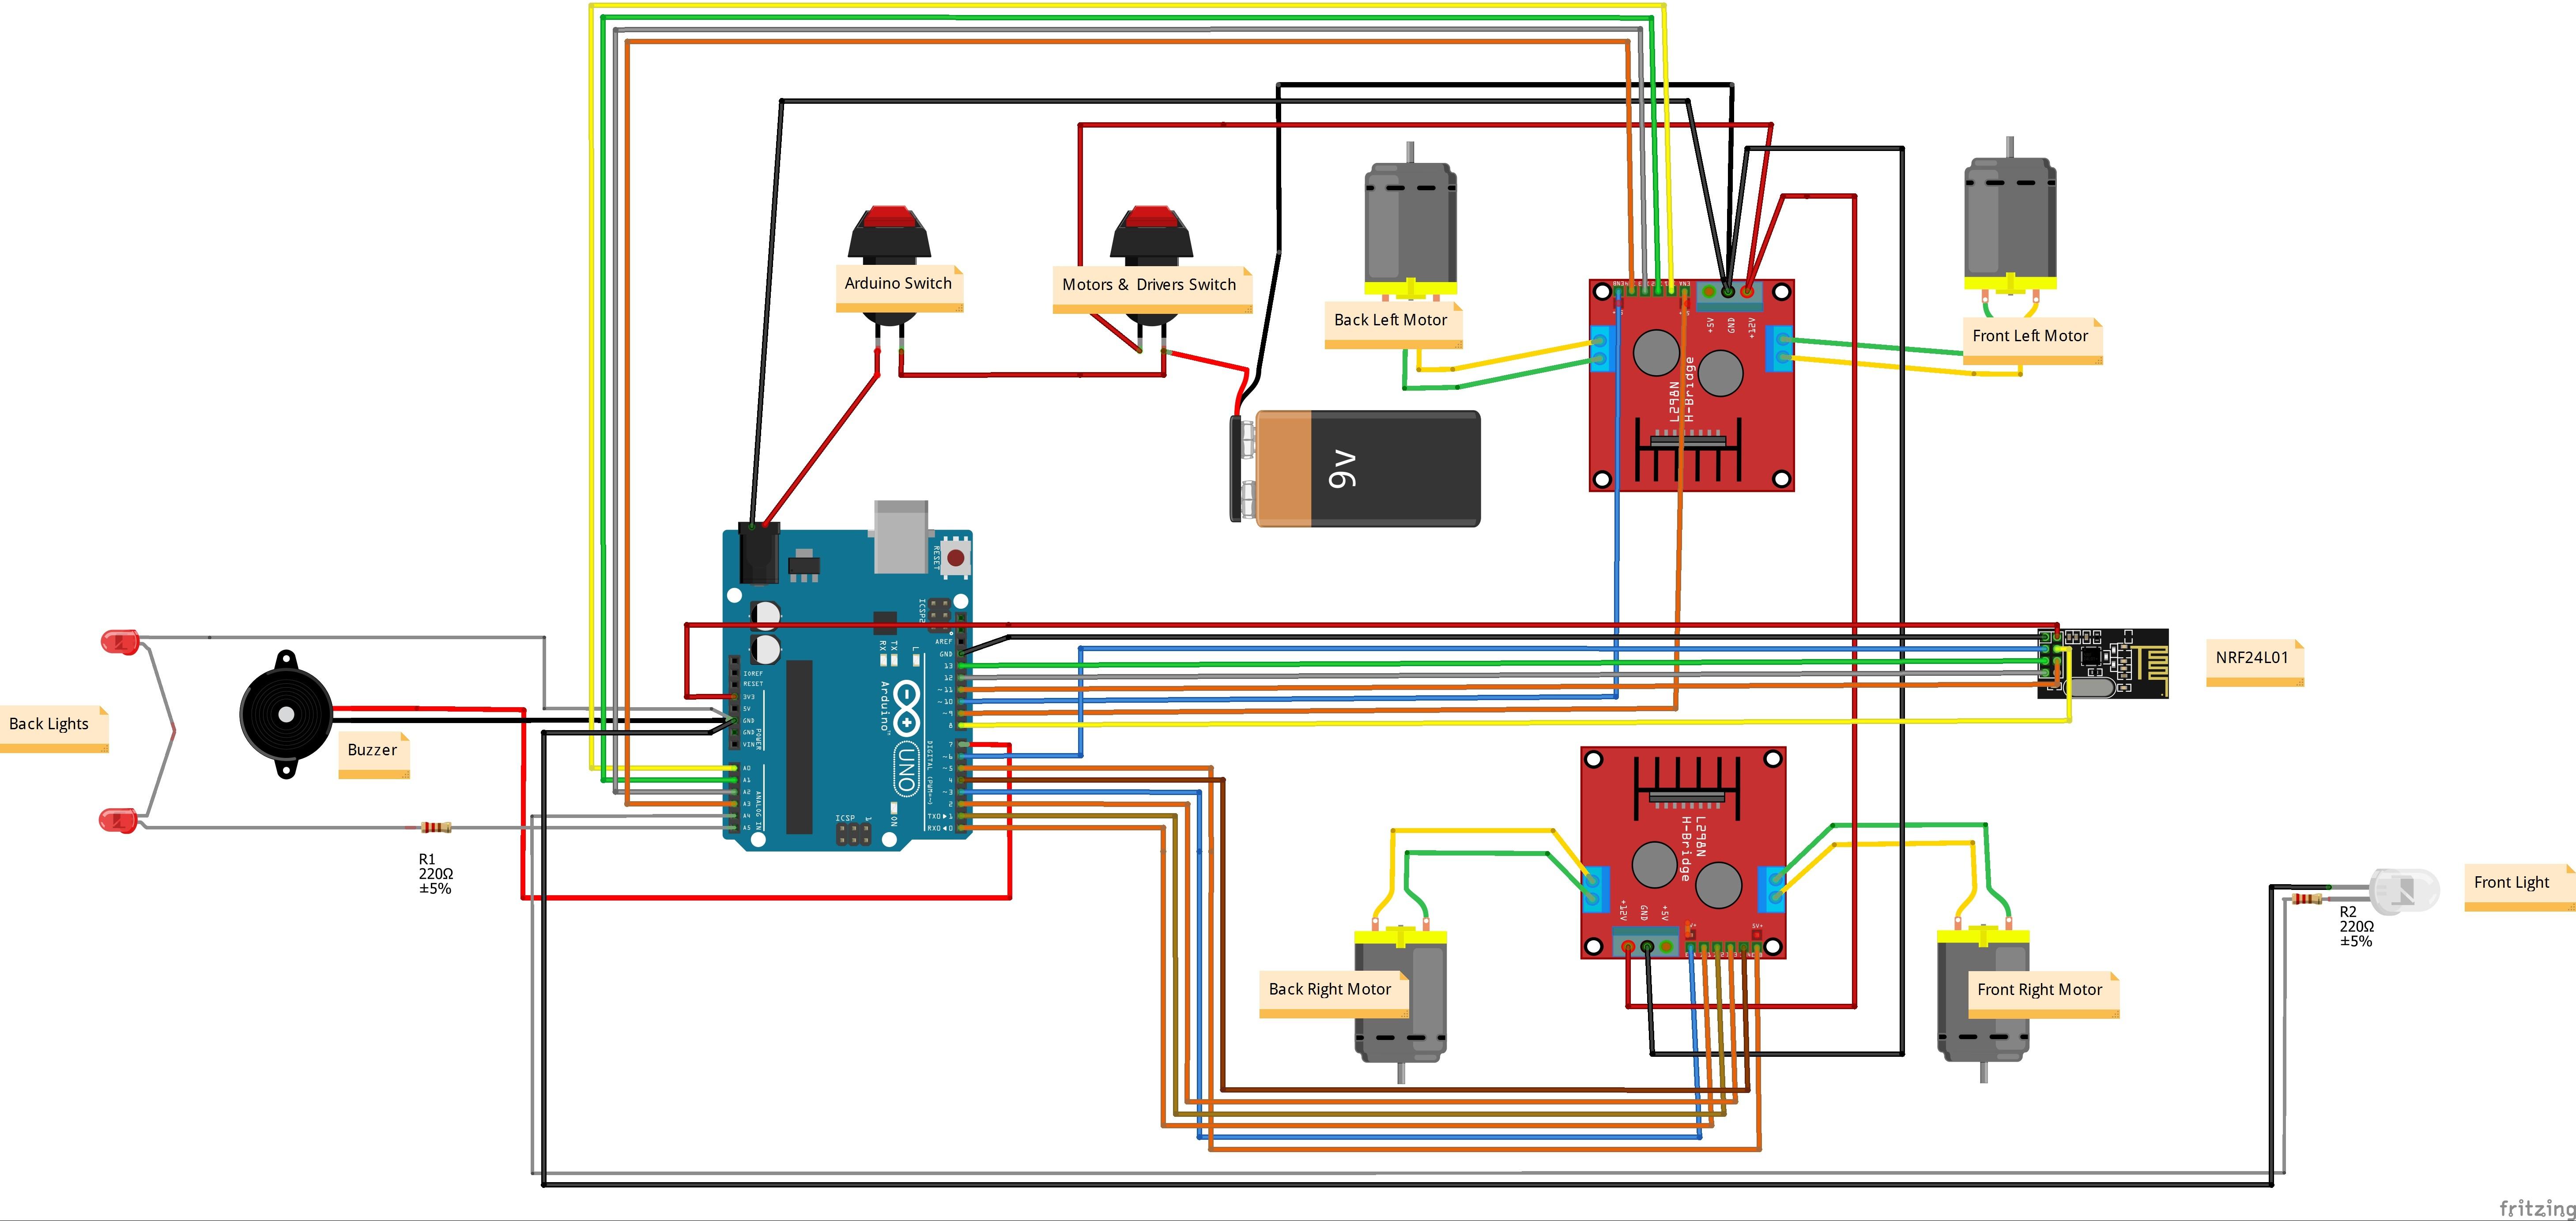 Remote Control Car Circuit Diagram Arduino 4wd Rc Car Hackster Of Remote Control Car Circuit Diagram